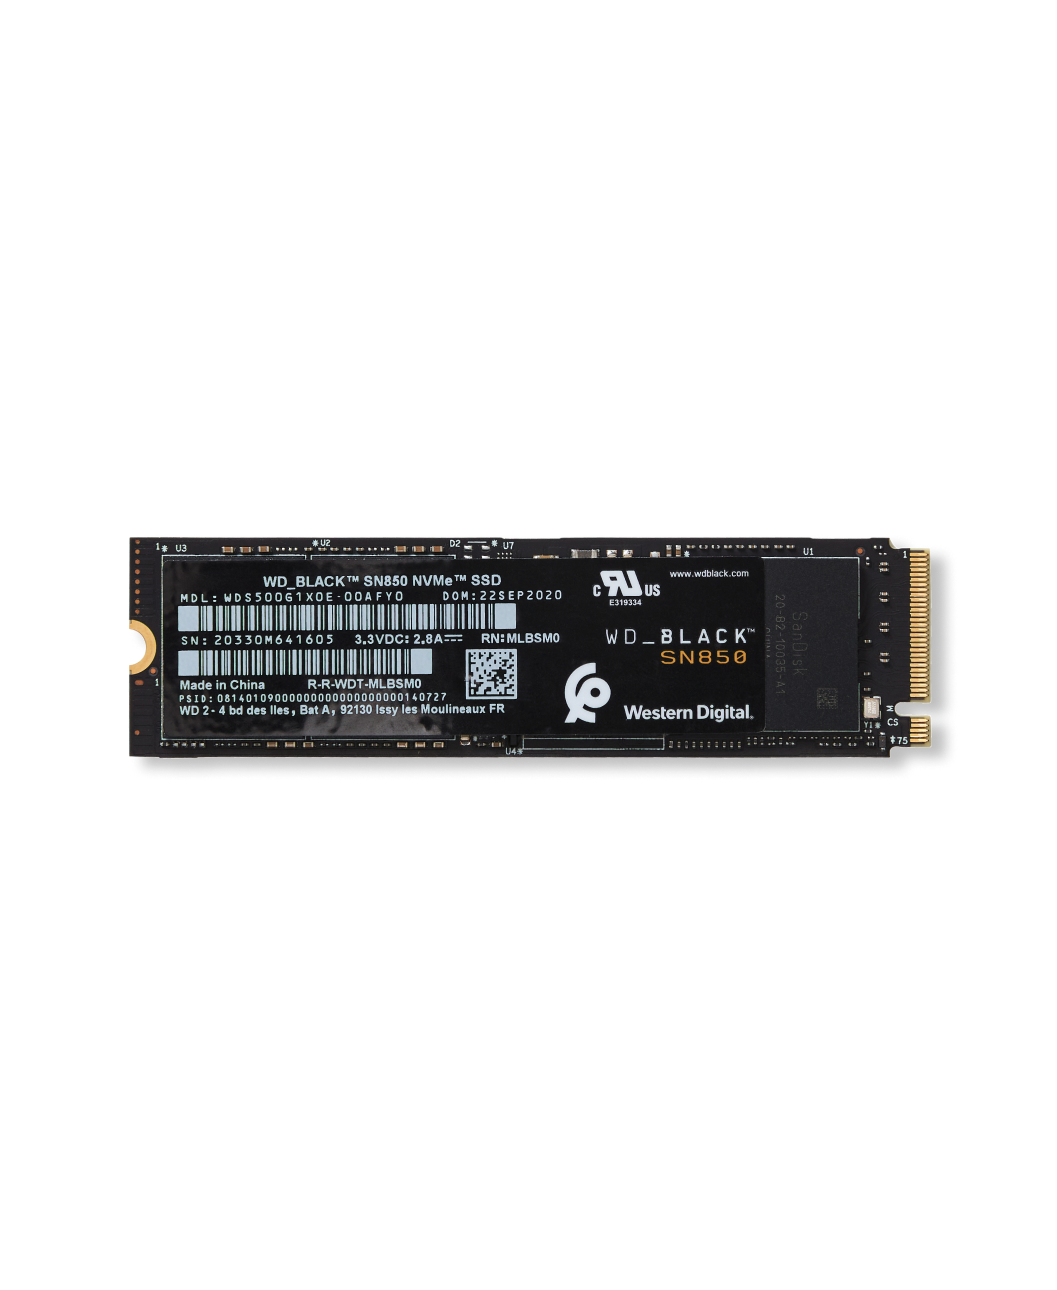 WD_BLACK™ SN850 NVMe™